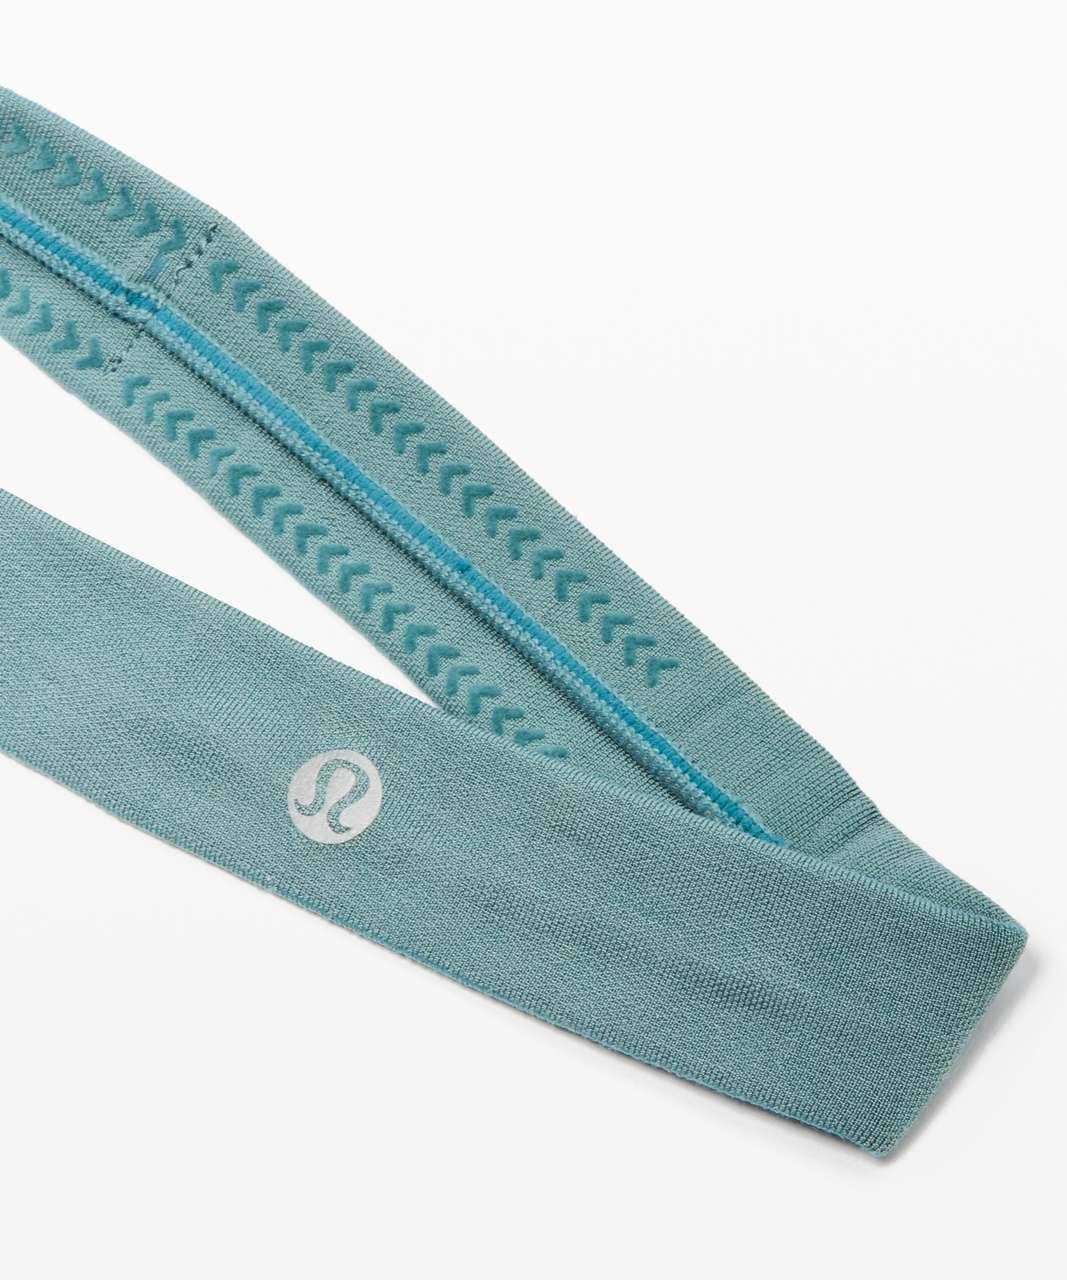 Lululemon Cardio Cross Trainer Headband - Aquatic Green / Aquatic Green